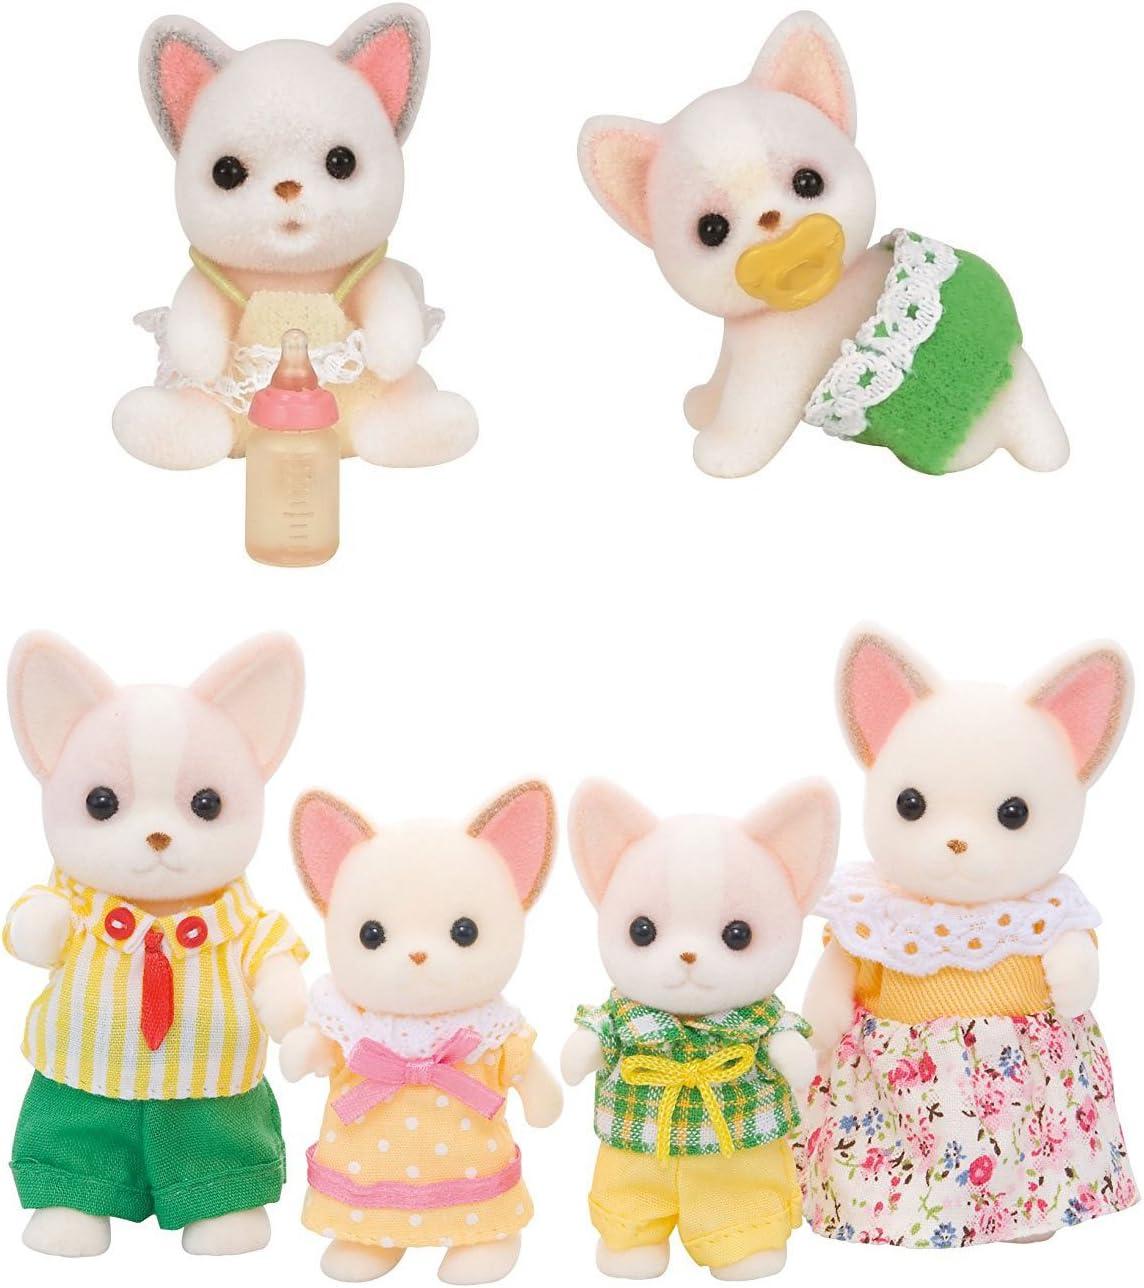 97 JP Epoch Calico Critters dolls Chihuahua twins i